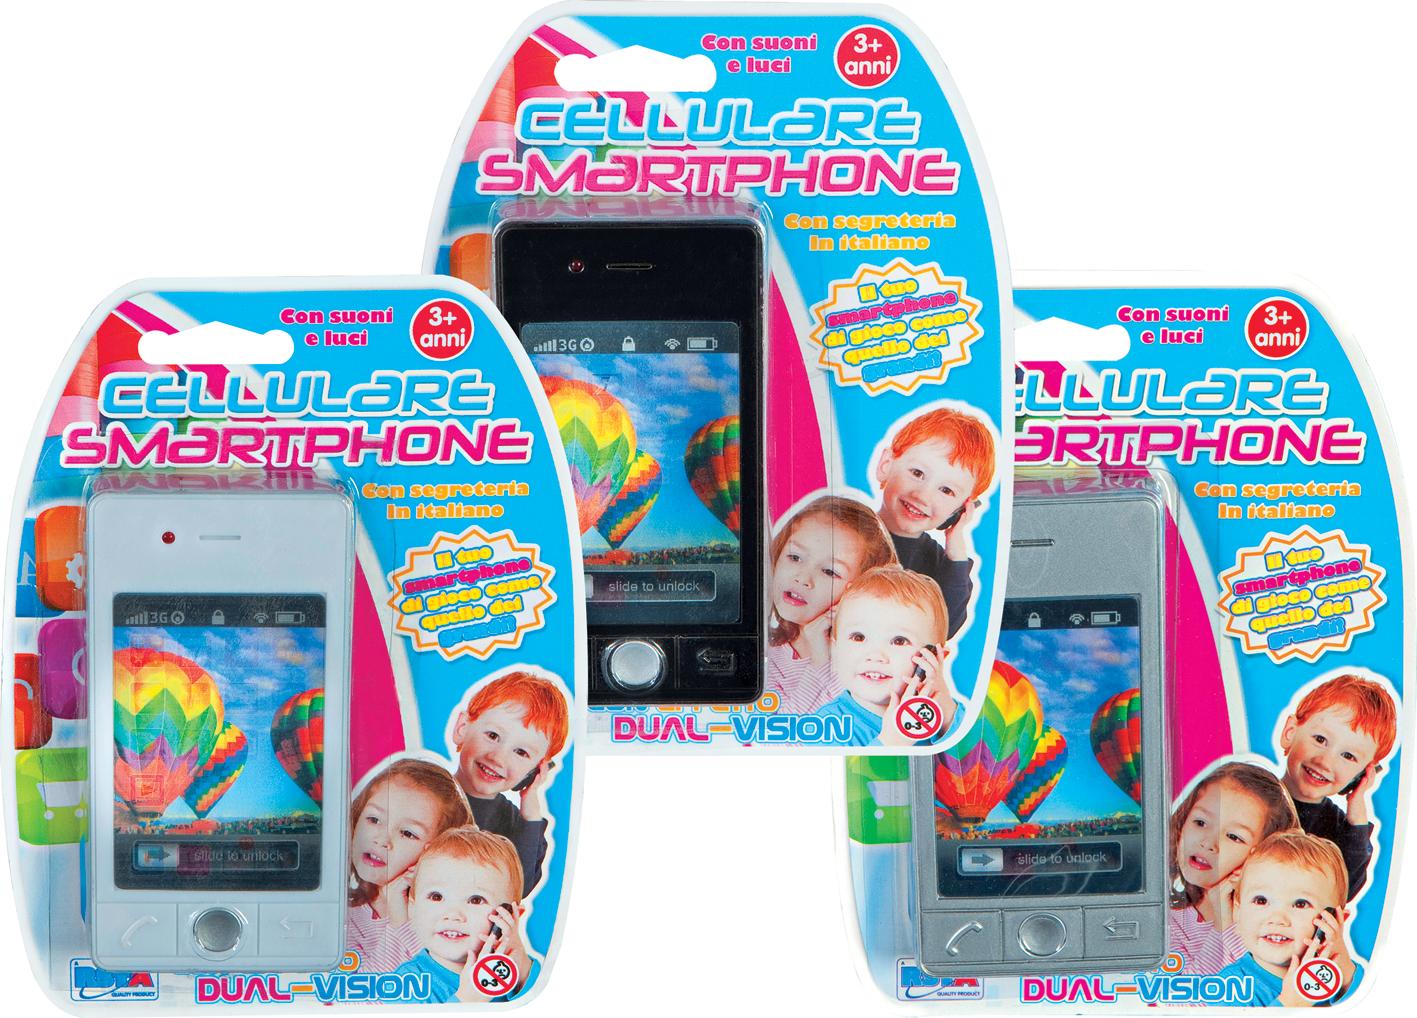 TELEFONINO SMARTPHONE B O